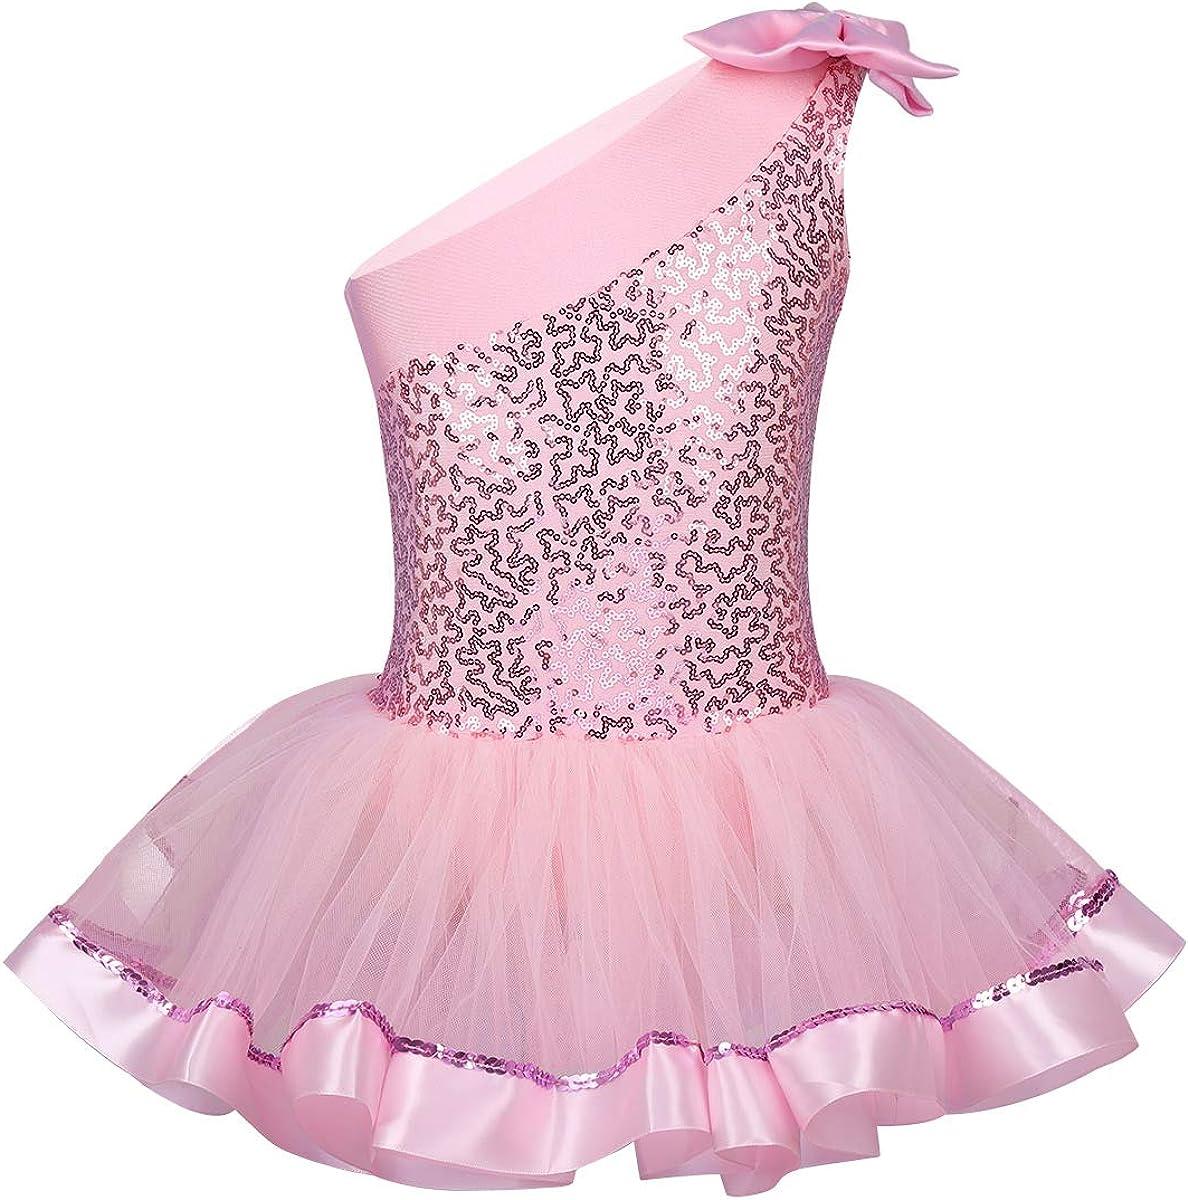 iiniim Girls Ranking TOP13 Shiny Sequins One Dance Gymnastics Ballet Shoulder Sacramento Mall